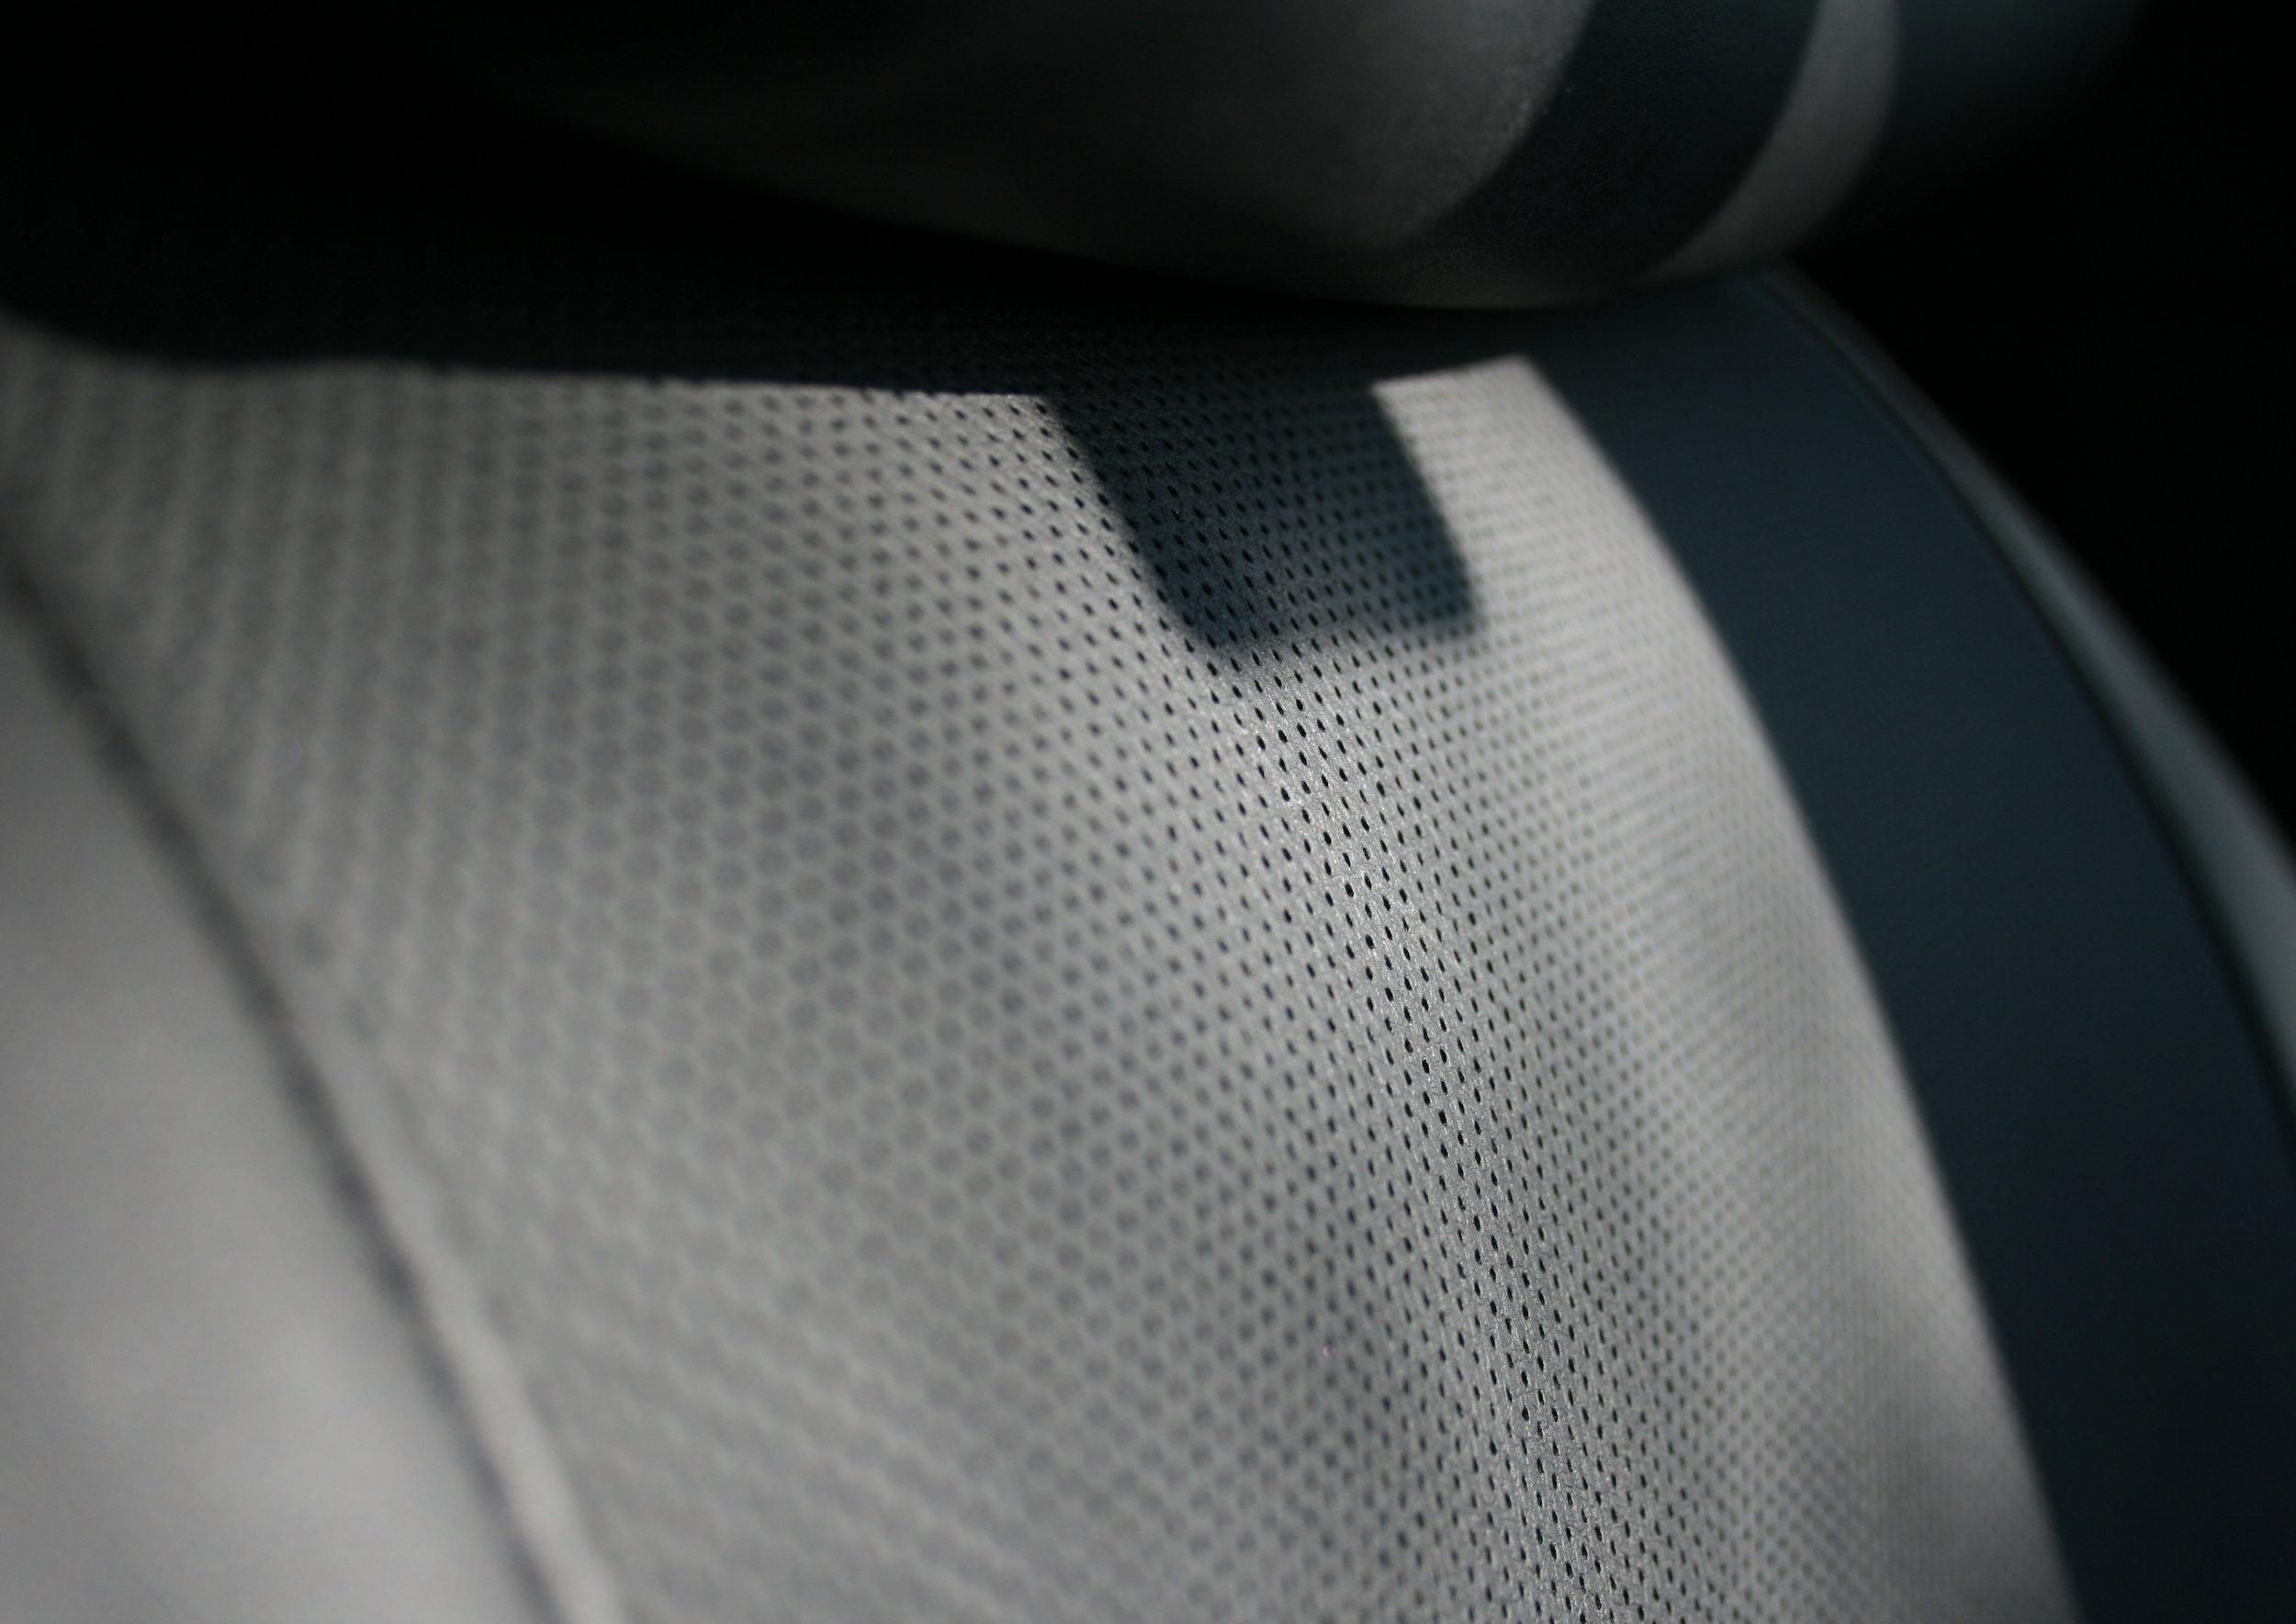 INTERIOR SEAT DETAIL.jpg